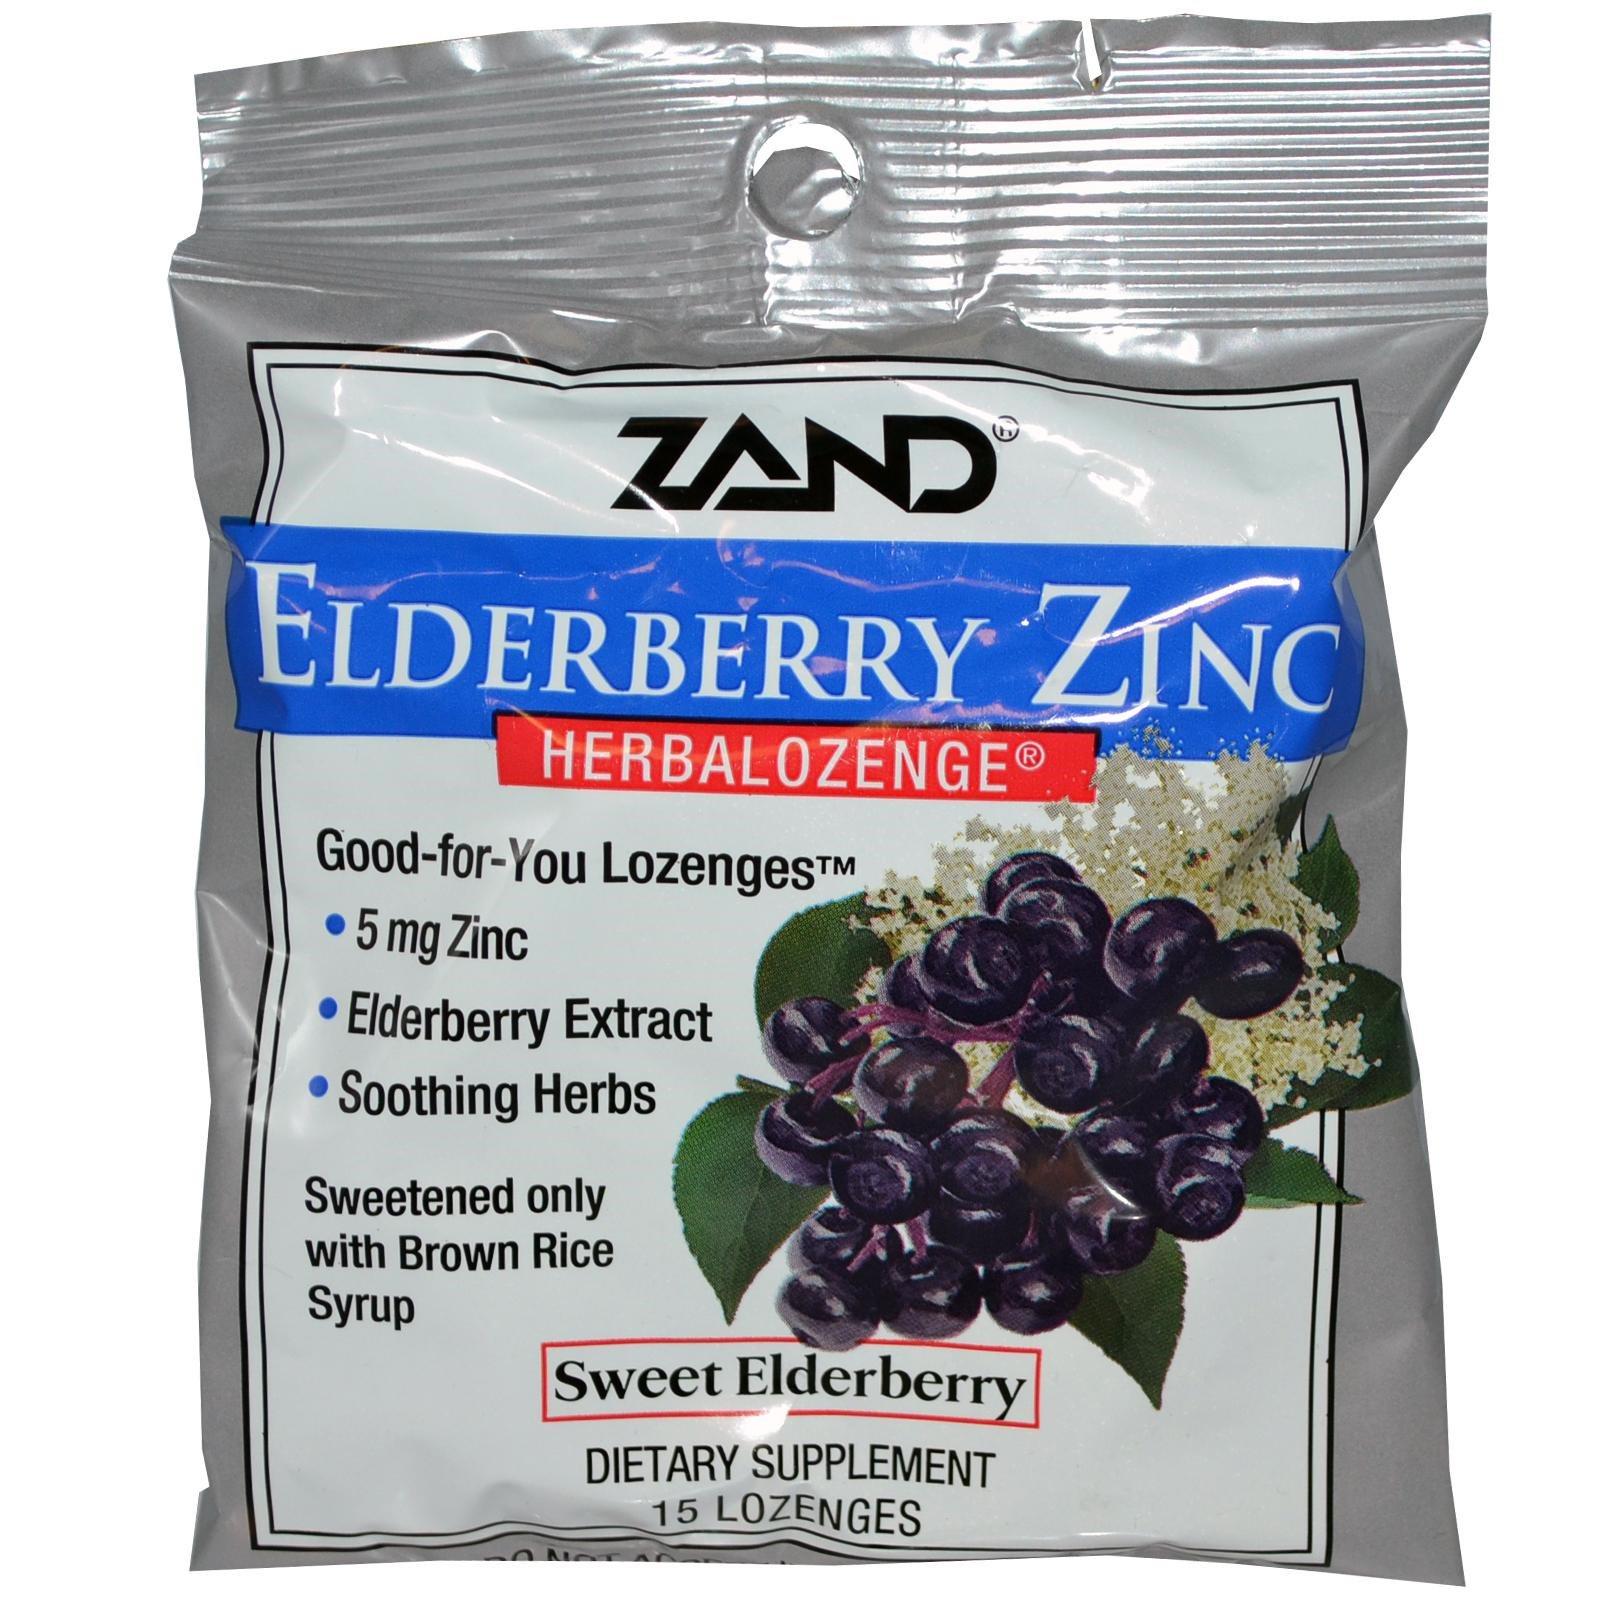 Zand Elderberry Zinc Herbalozenge Sweet Elderberry 15 Lozenges